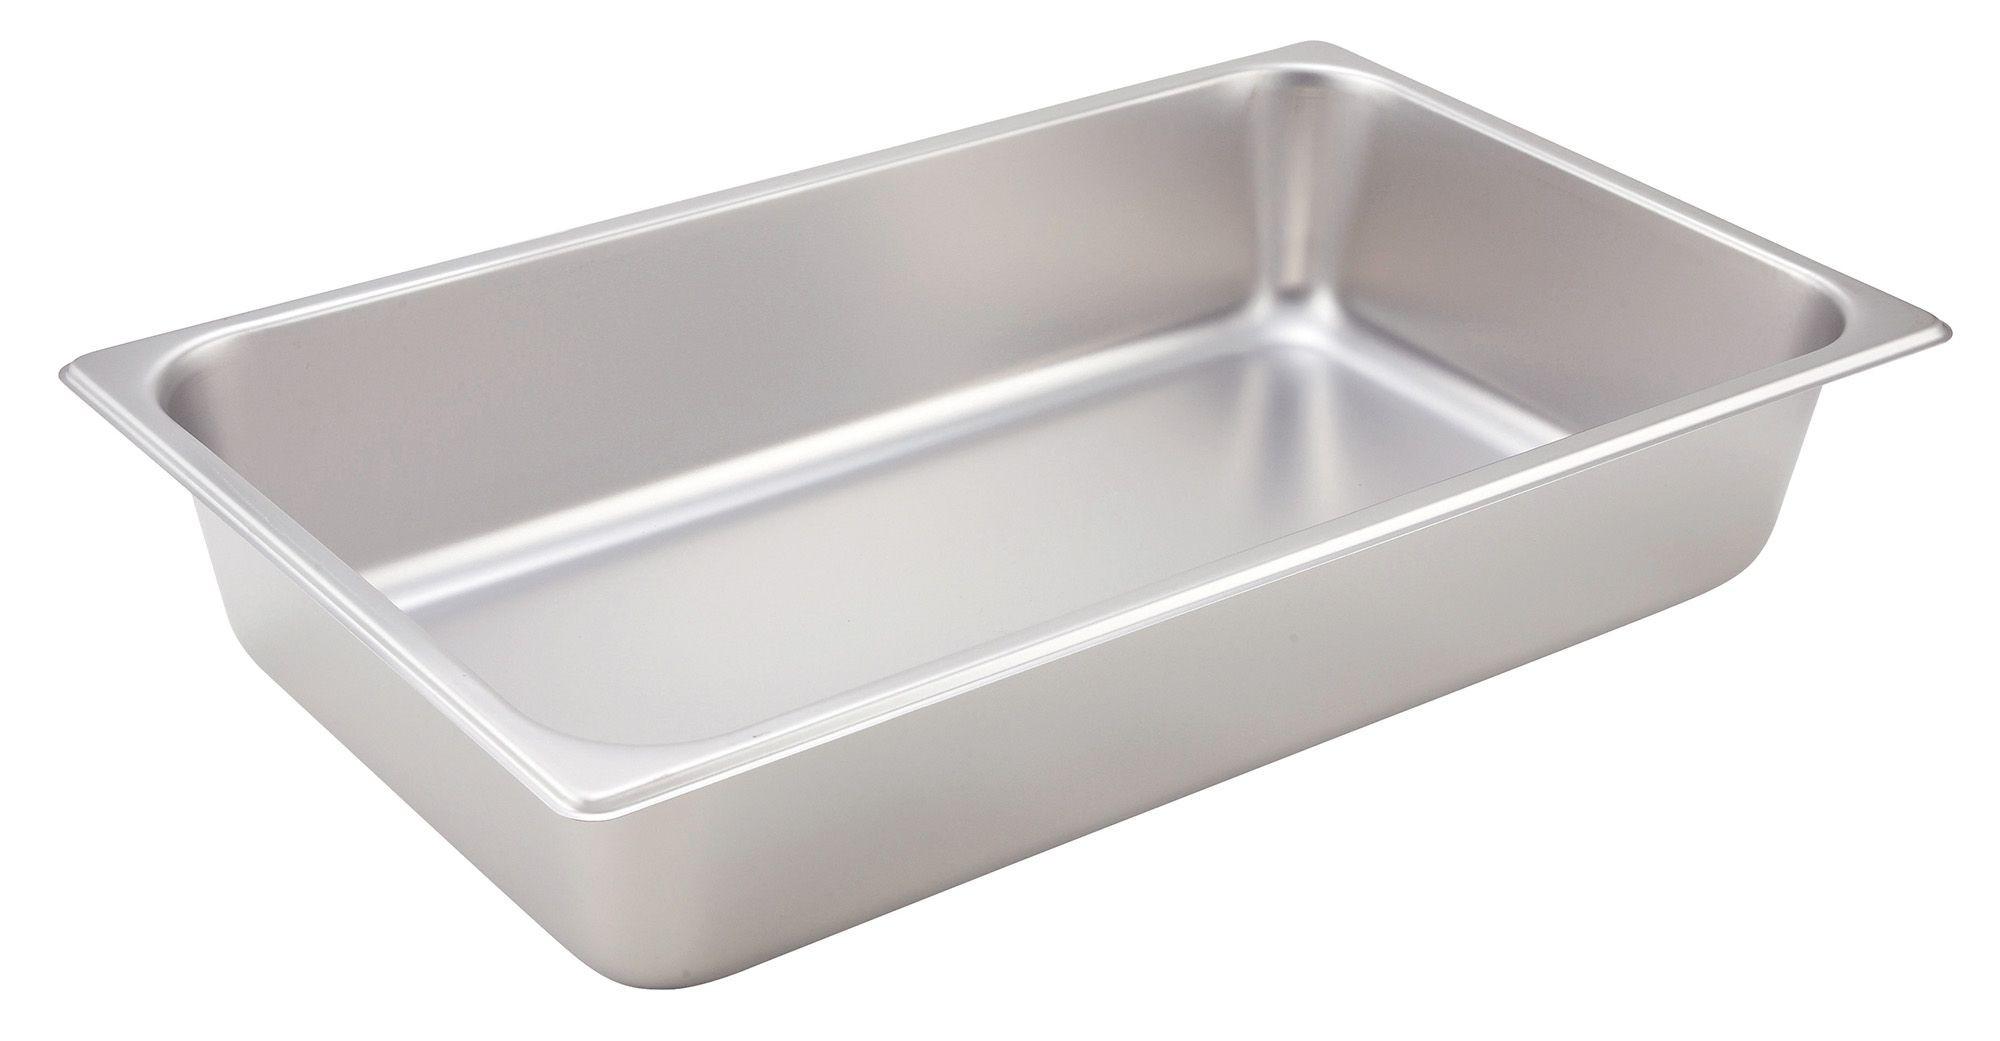 "Winco SPF4 Full Size 25 Gauge Steam Table Pan 4"" Deep"